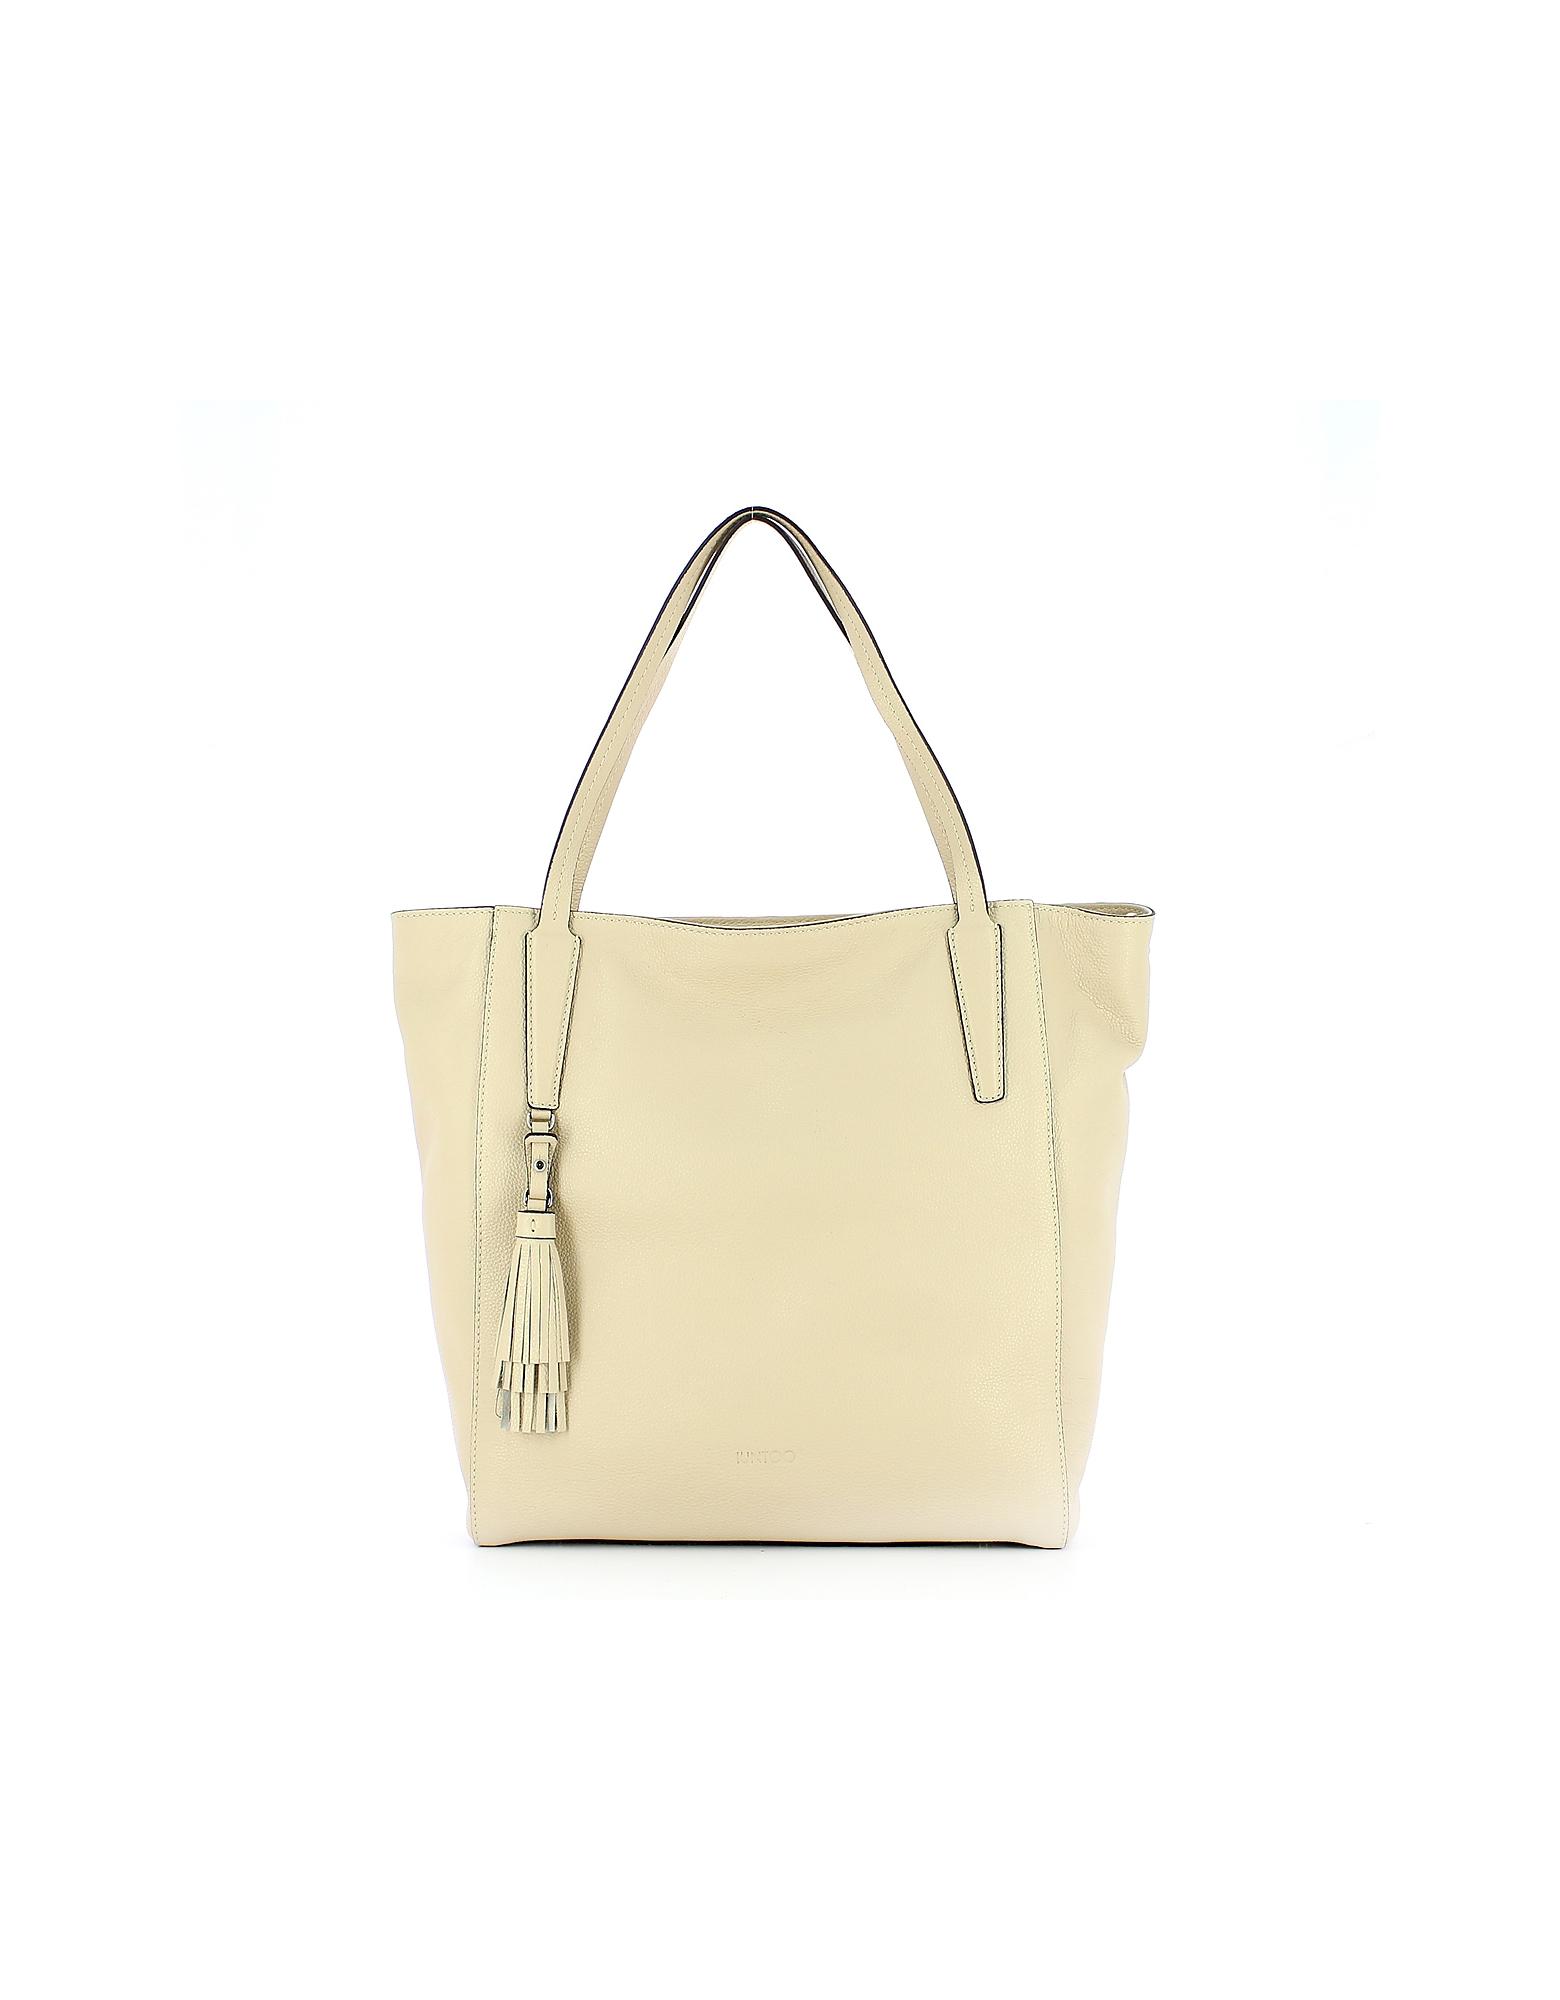 IUNTOO Designer Handbags, Beige Leather Armonia Tote Bag w/Tassel